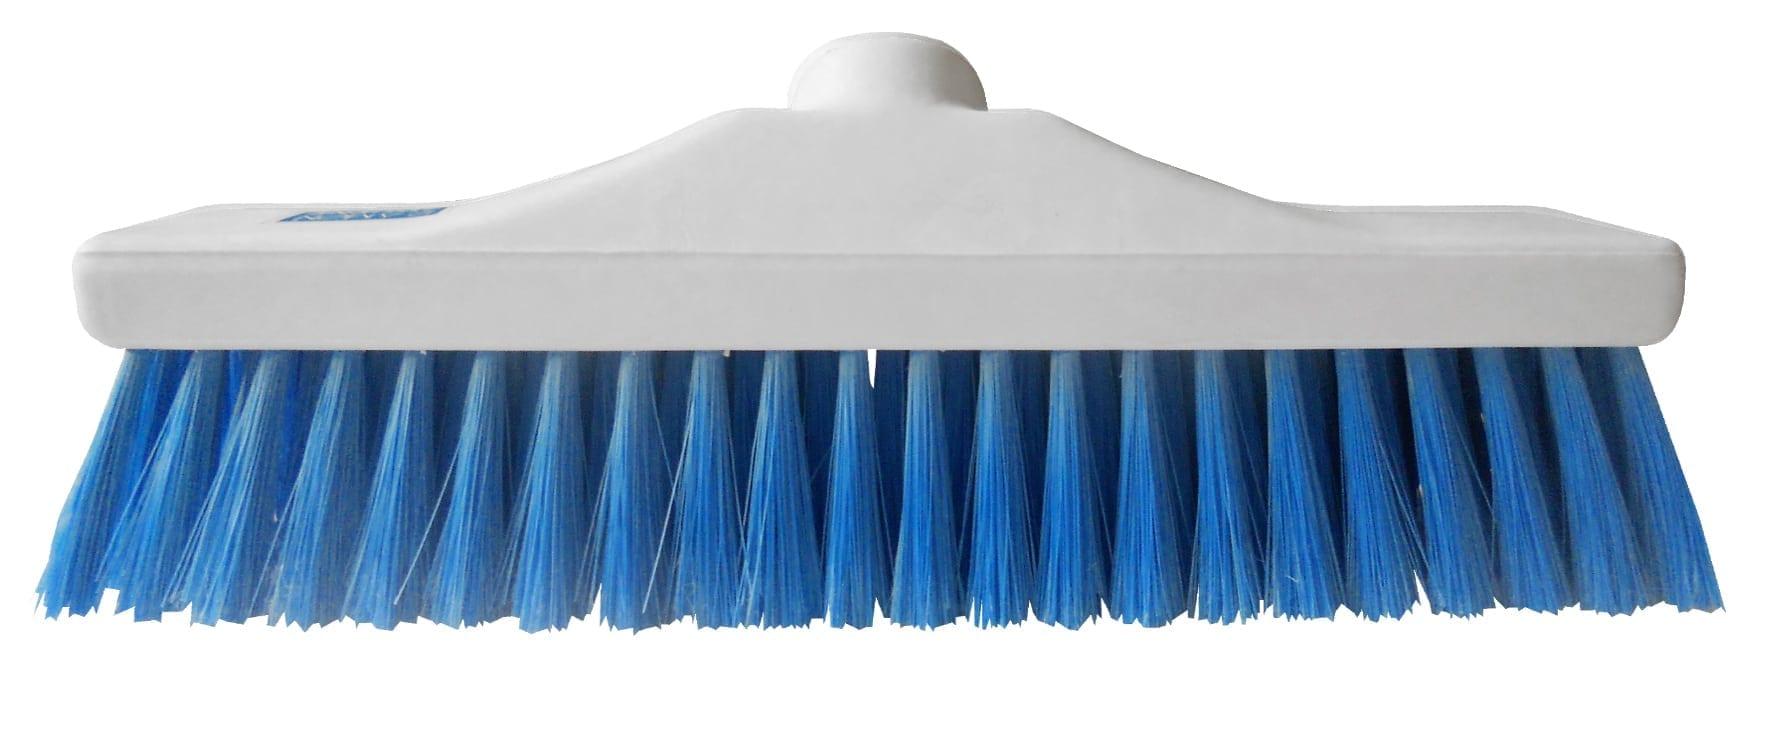 "Hygiene Brush Head 12"" - Soft Bristle - Blue"